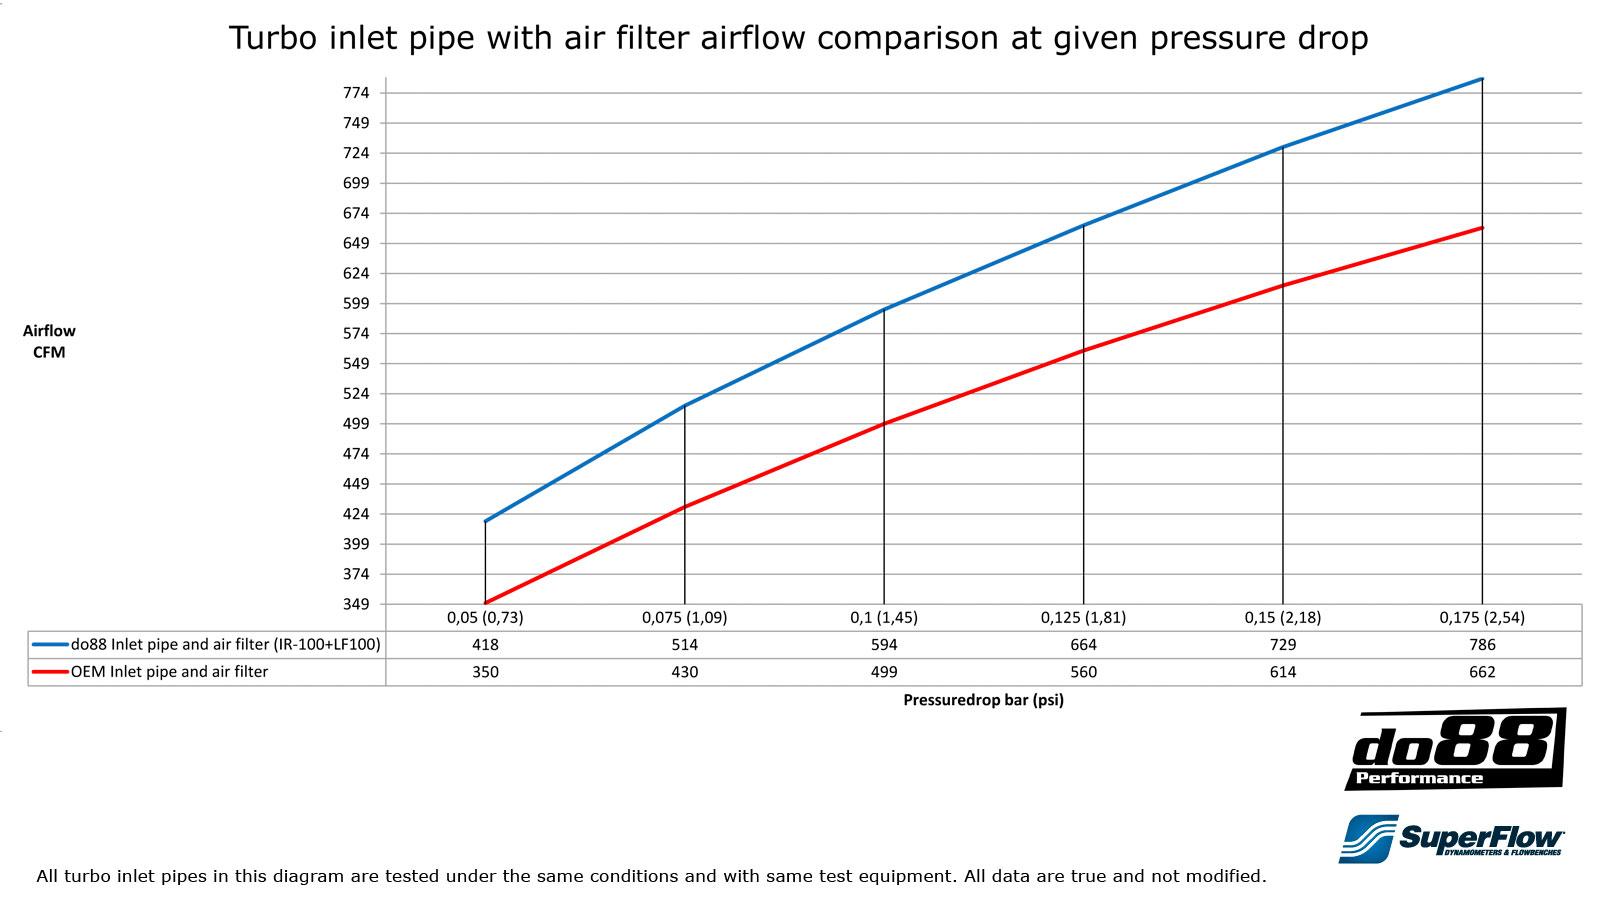 lf-100-air-flow-diagram.jpg